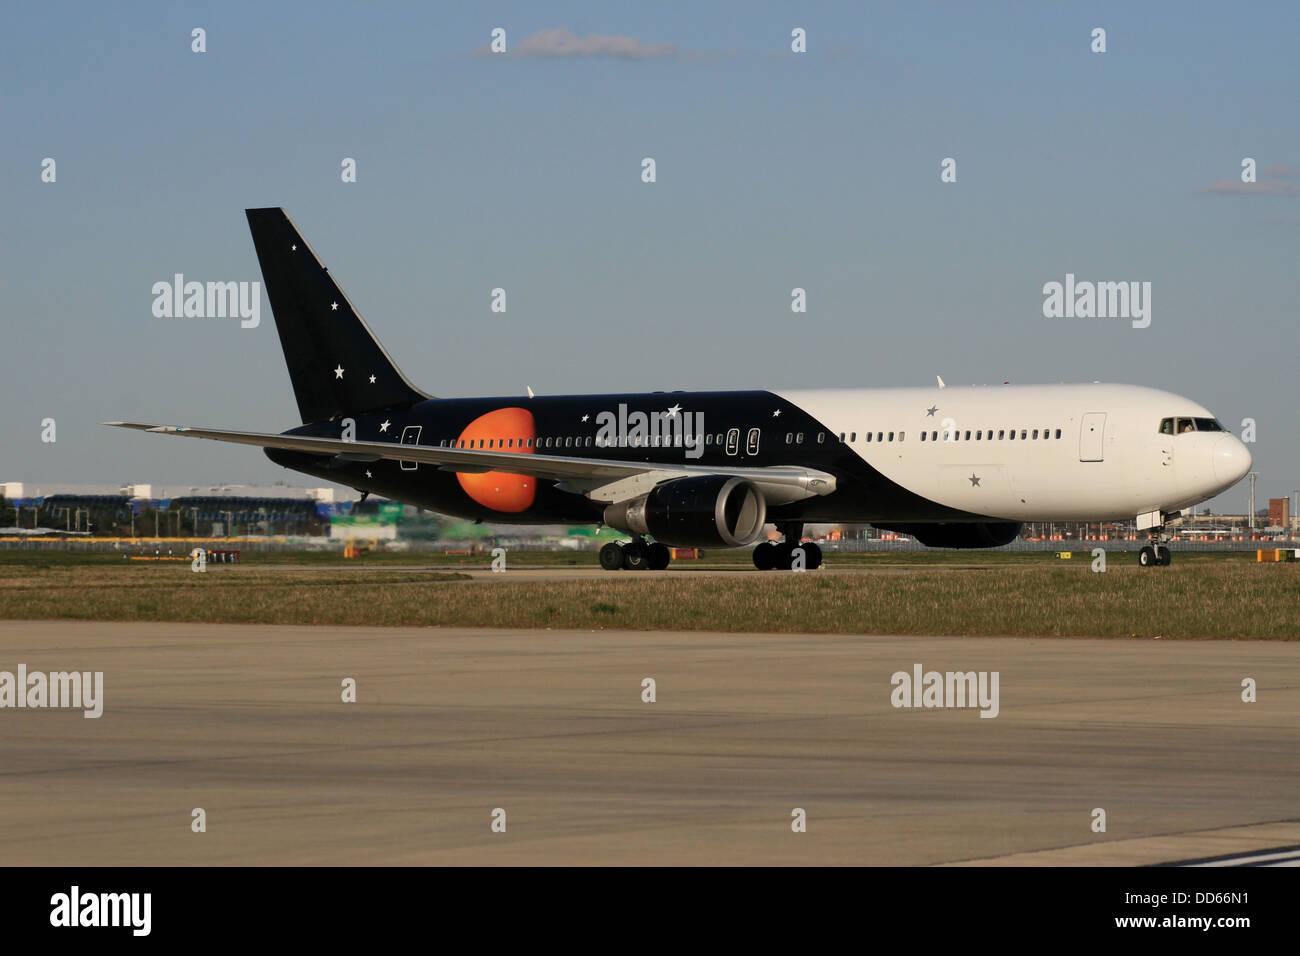 TITAN AIRWAYS - Stock Image